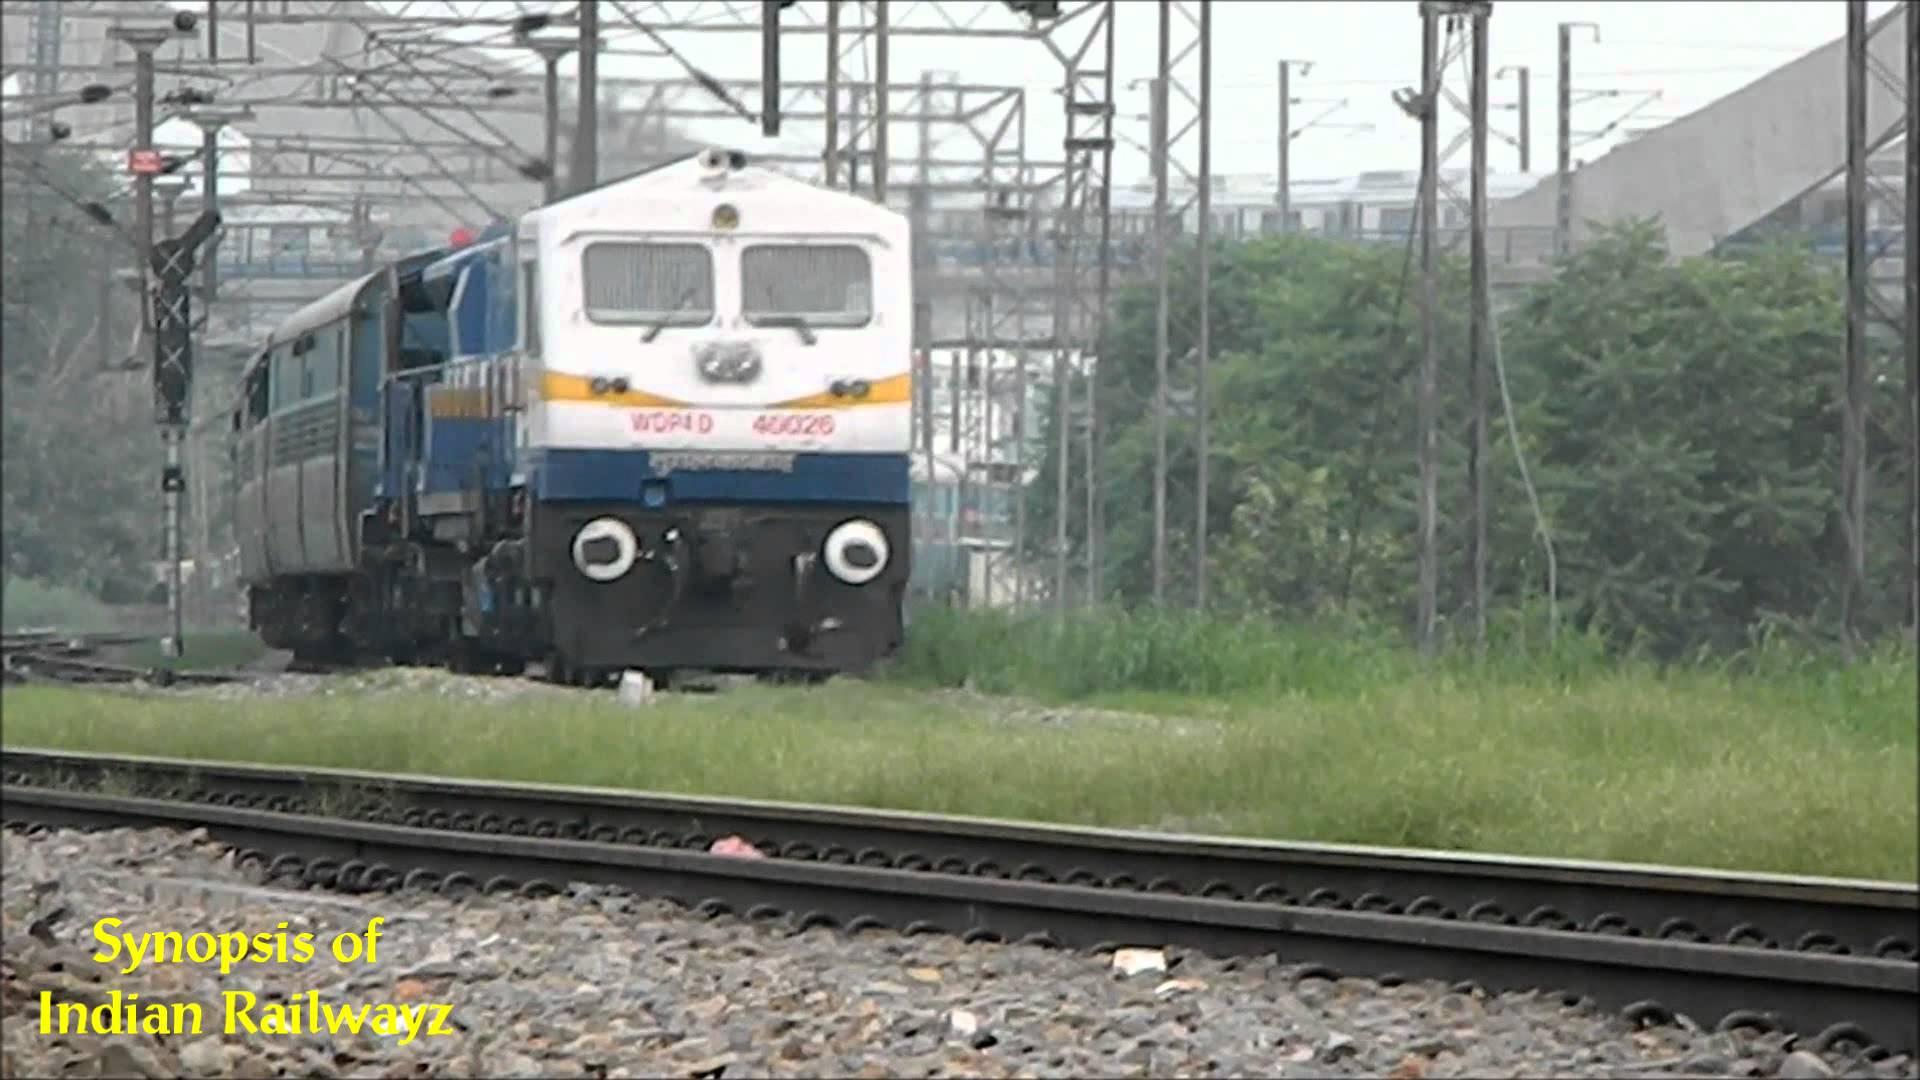 Indian Railway Train Hd Wallpaper